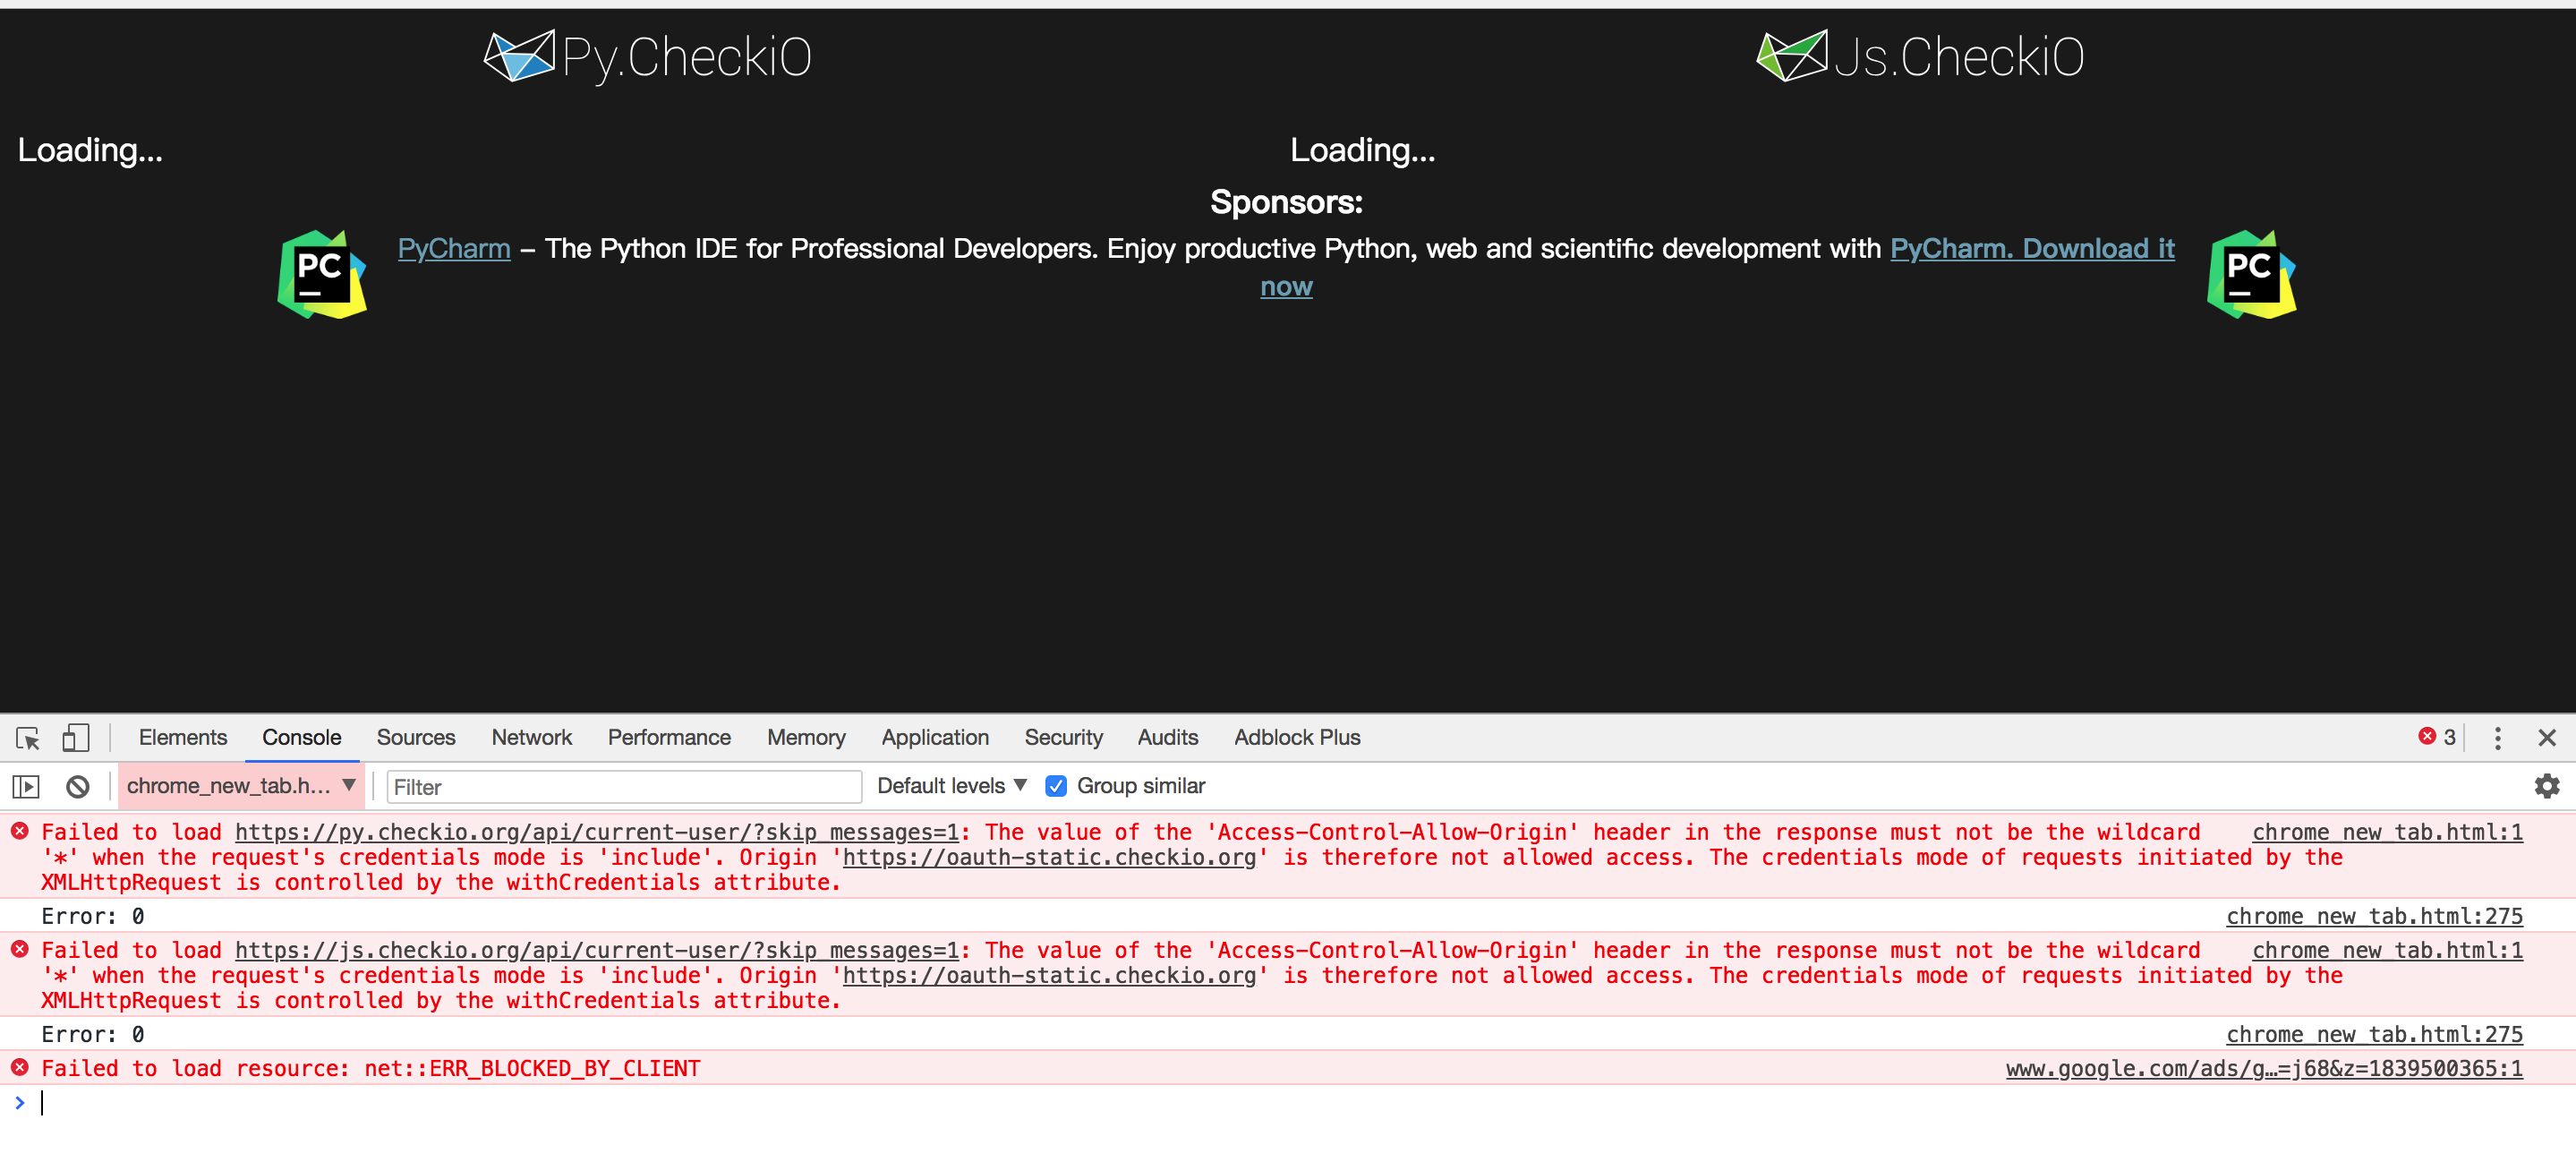 Introducing CheckiO's Web Plugin - python coding challenges